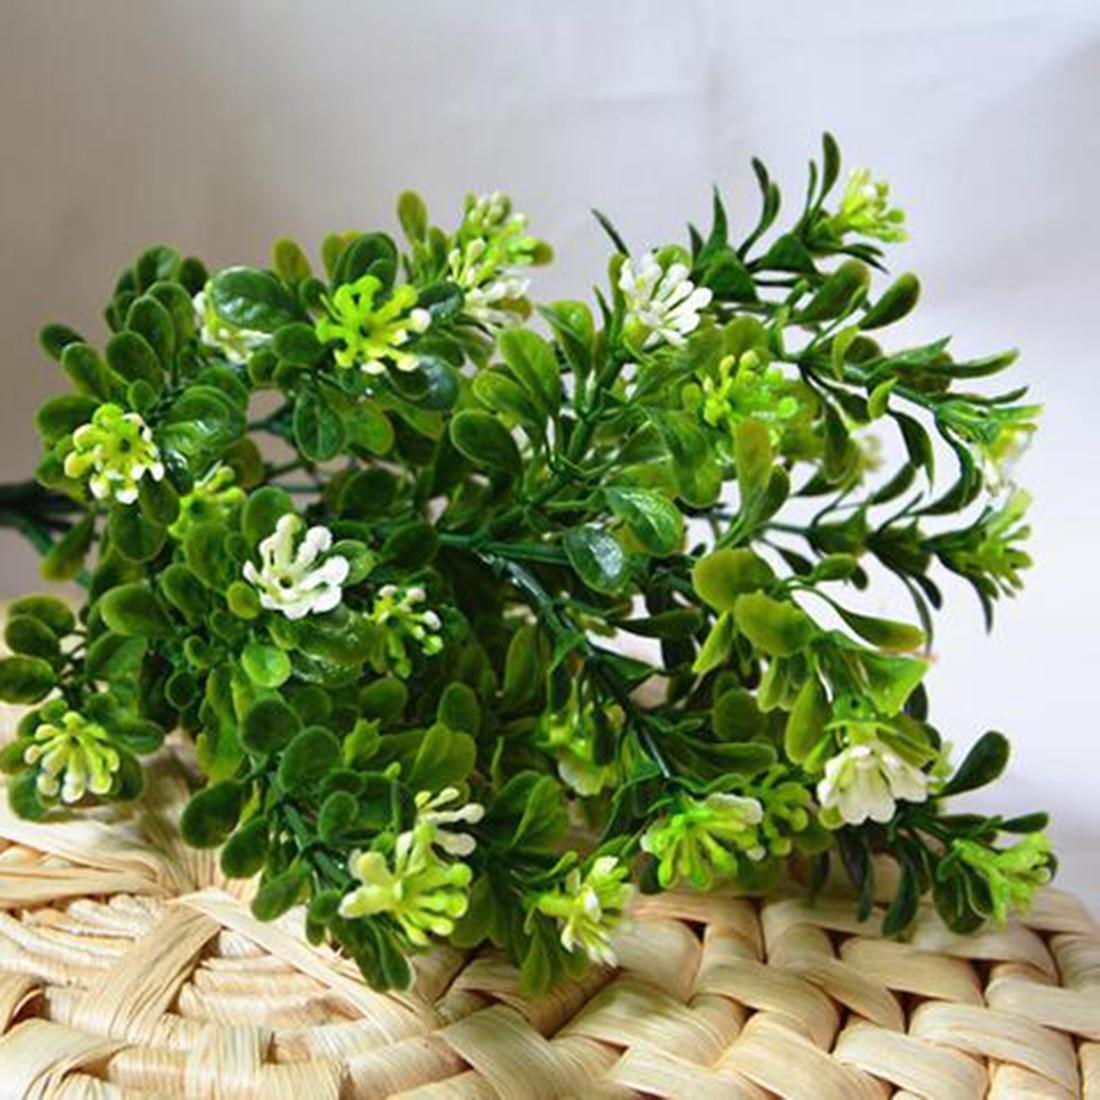 7 Branch/Bouquet 35 Heads Artificial Green Plant Fake Milan Grass Bonsai Decoration Leaf Corner Lawn Decoration